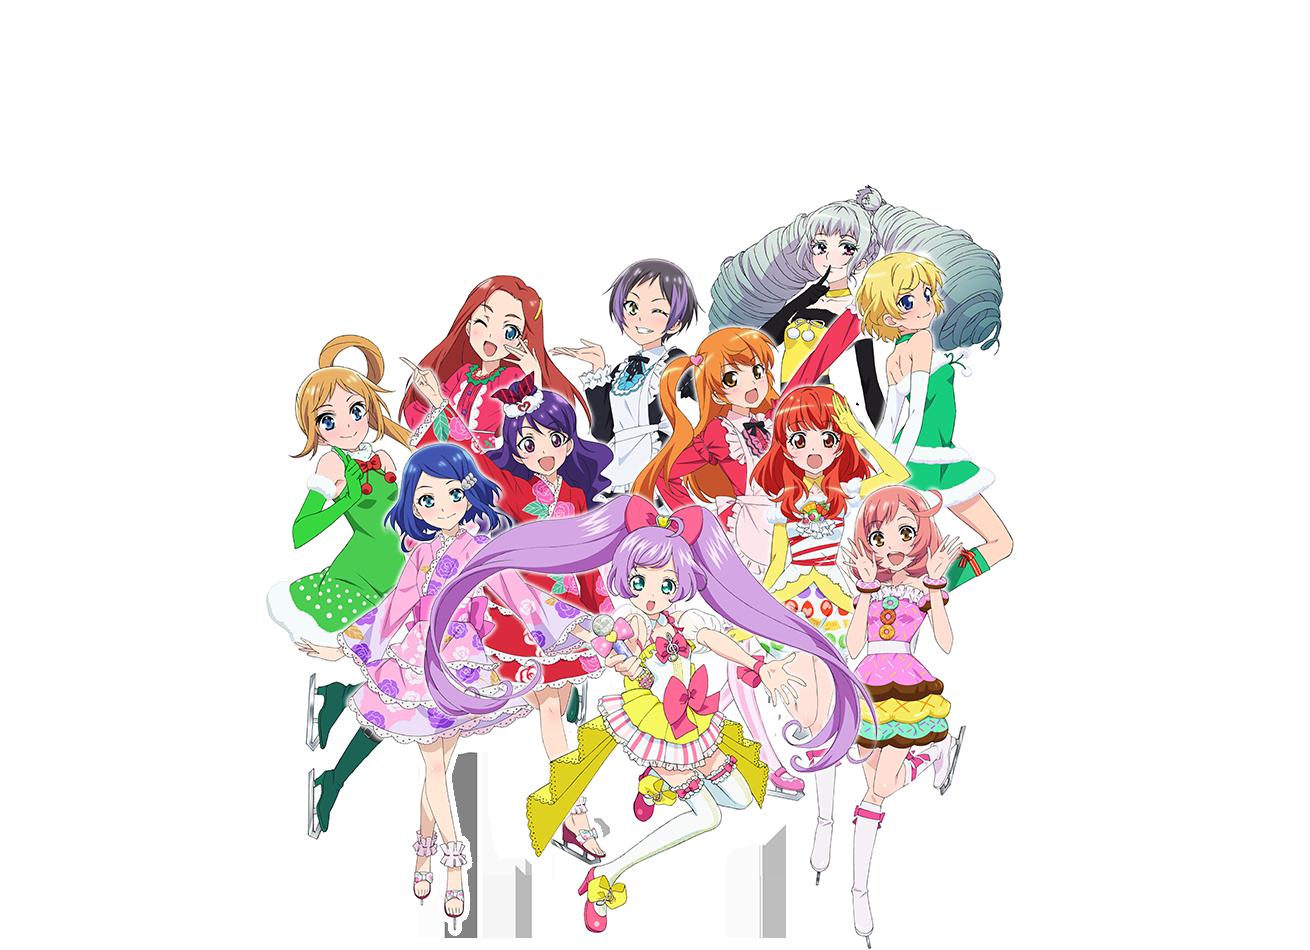 Action Figures Anime & Manga Enthusiastic Bandai Gasha Portraits Love Live Sunshine ~ Summer Va